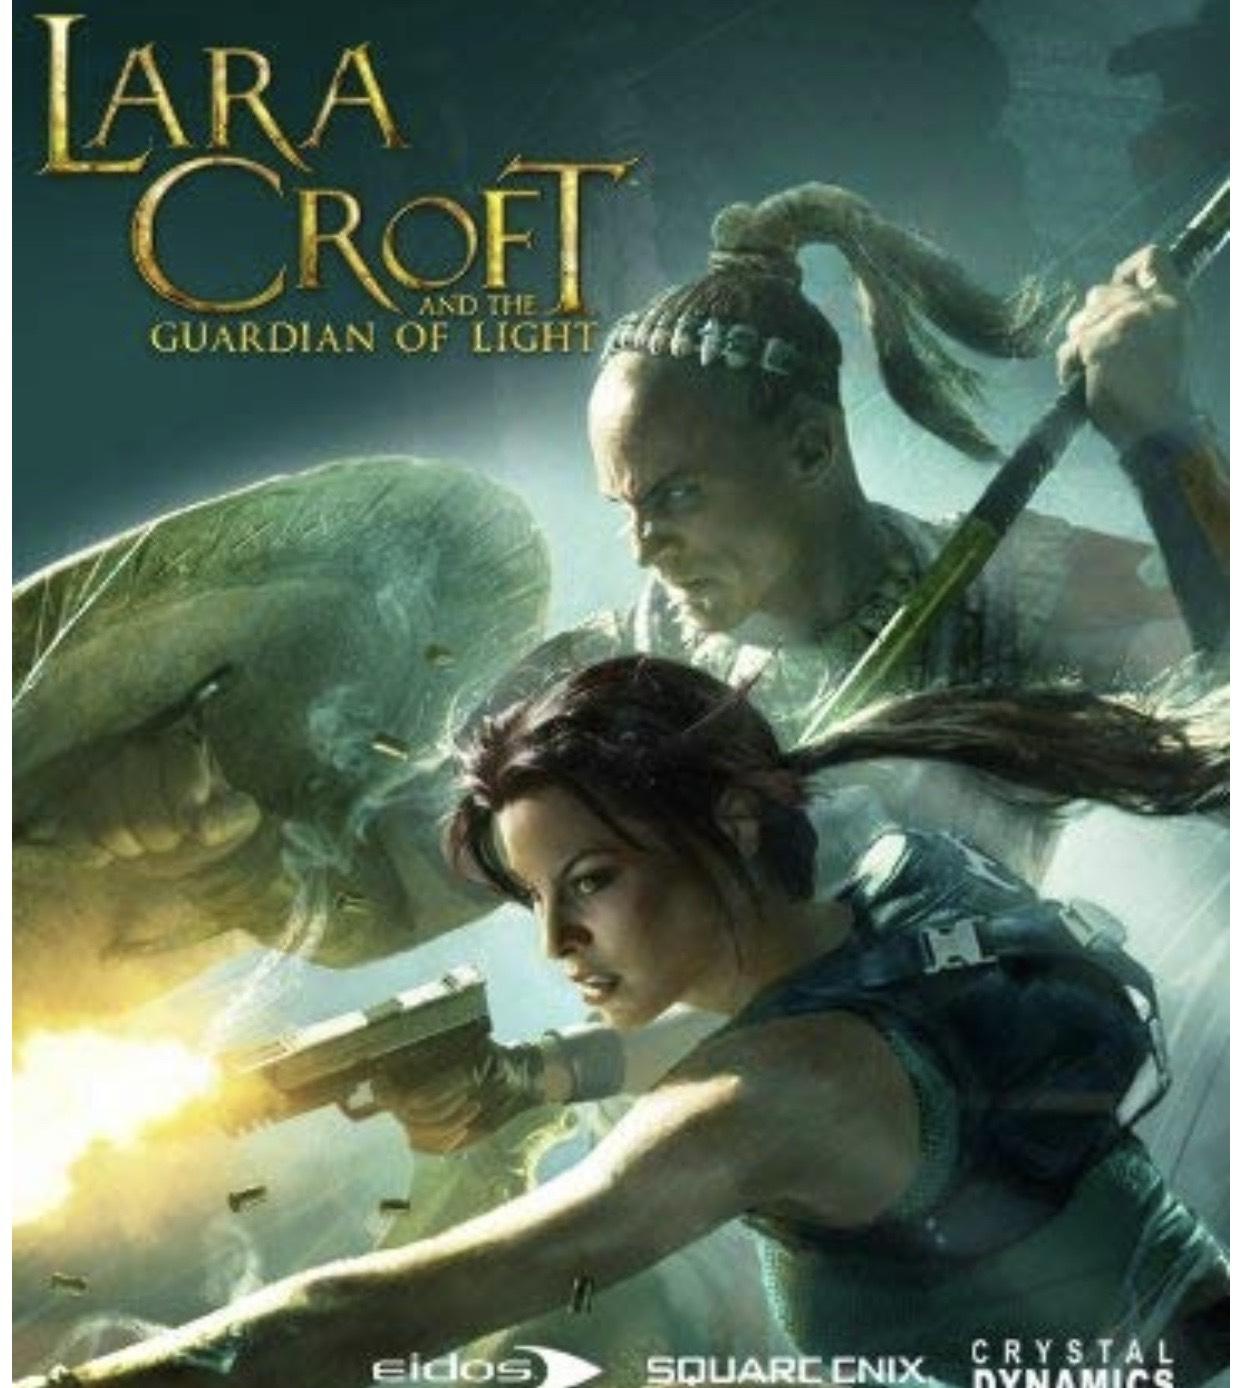 Lara Croft Guardian of Light (Xbox 360 / Xbox One) £1.19 @ Microsoft store